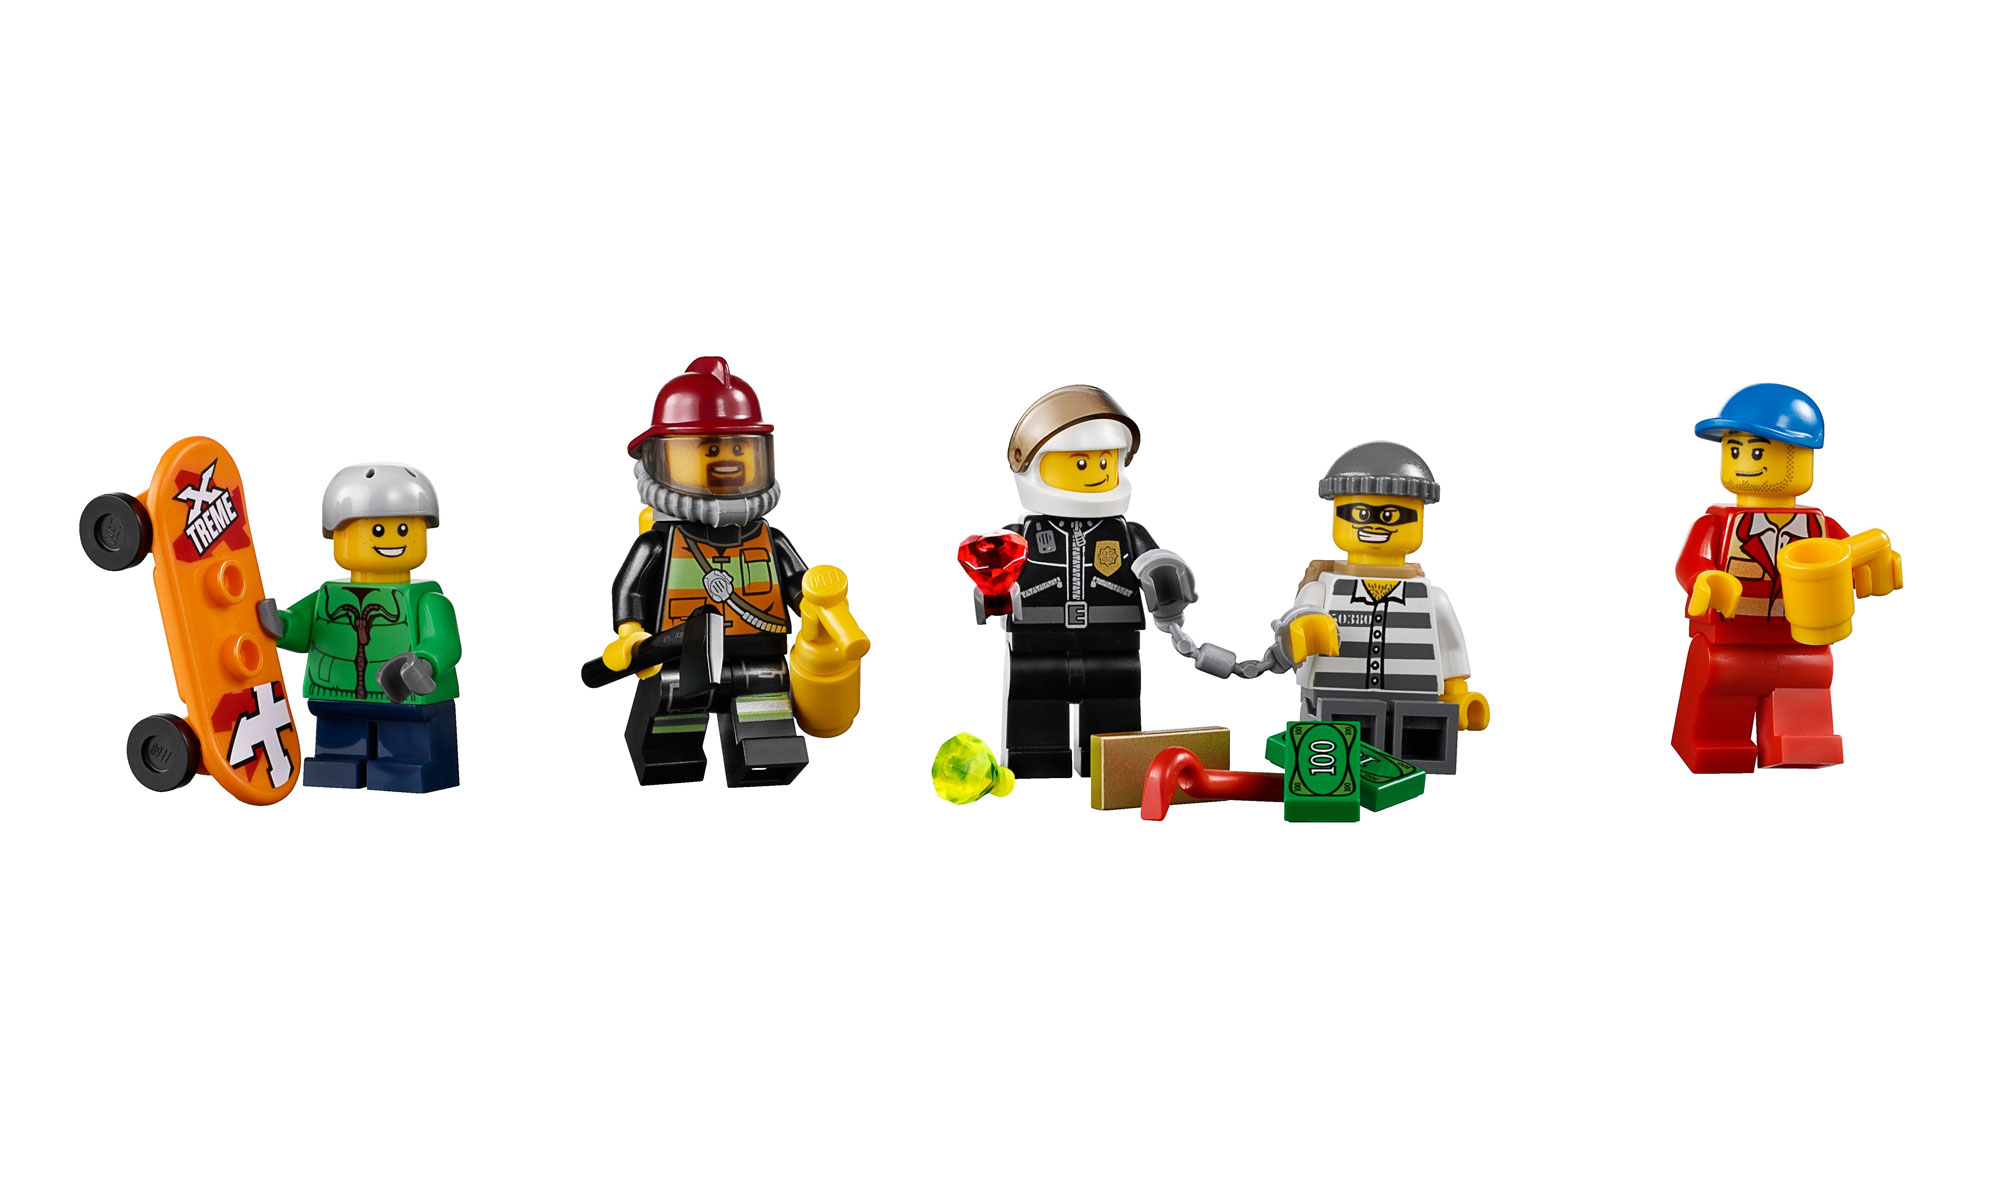 Lego 60023 lego city lego city starter set lego city for Lago shop online